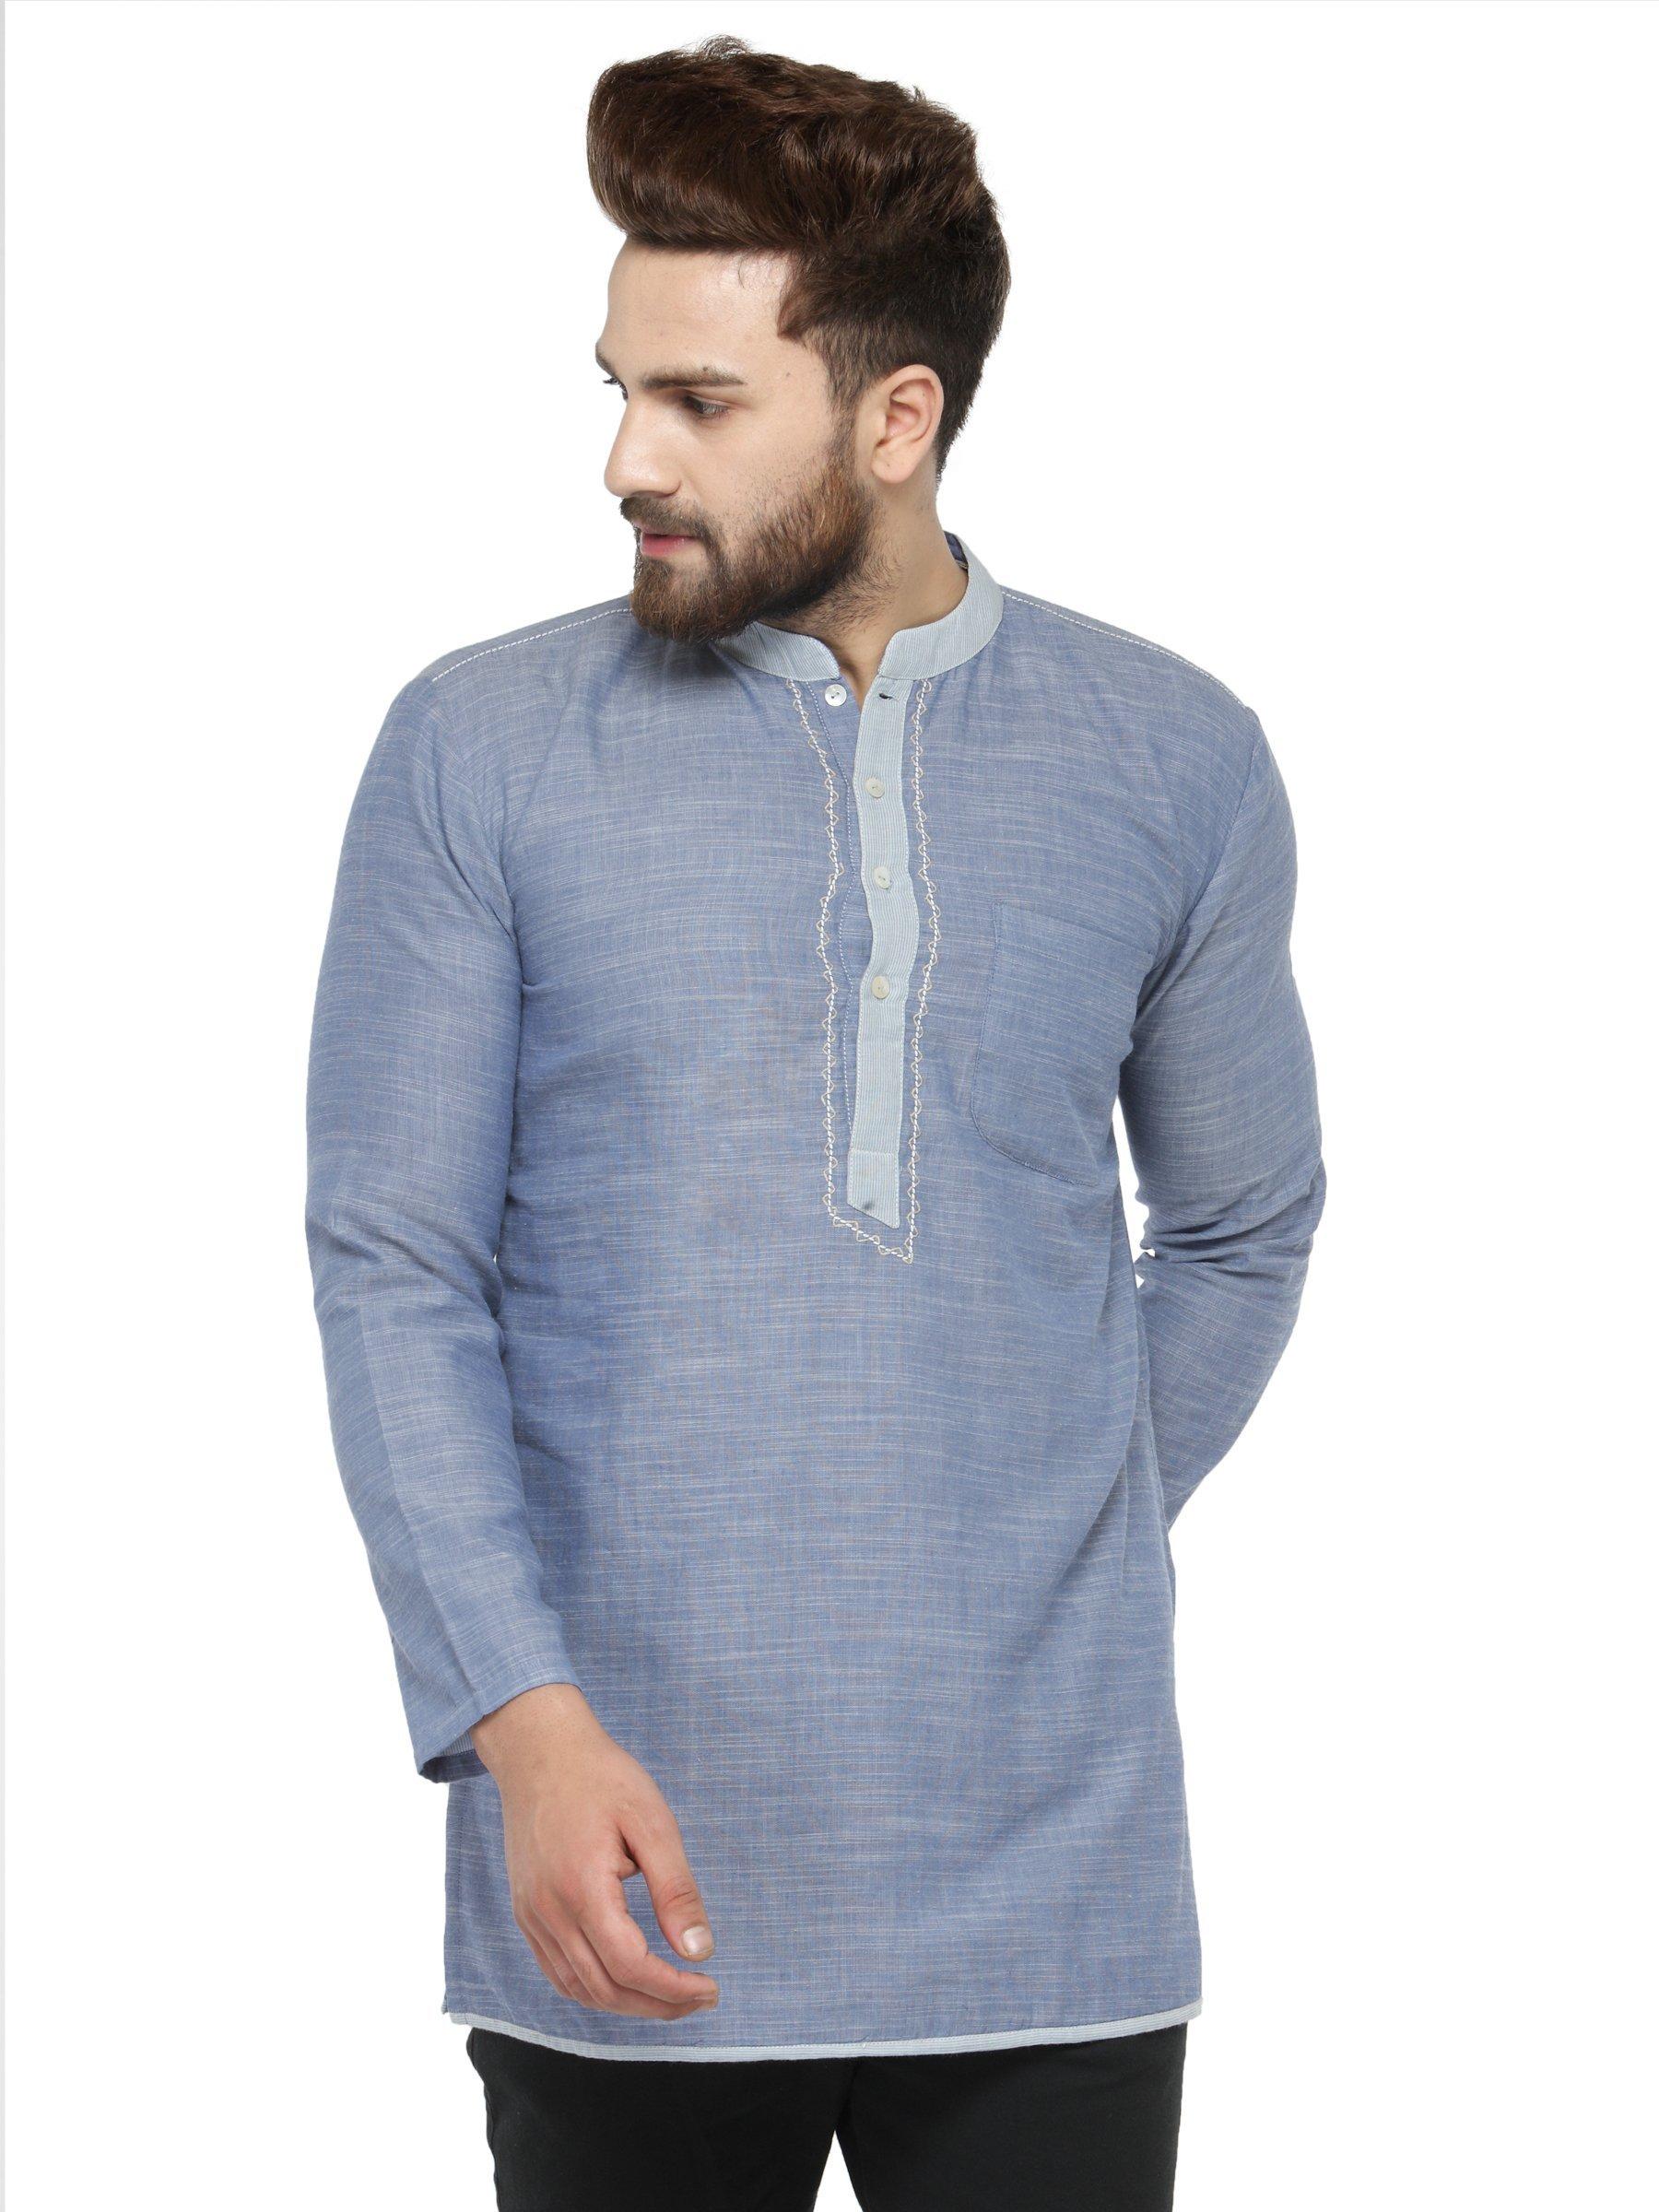 Apparel Men's Cotton Designer Short Kurta 38 Sky Blue